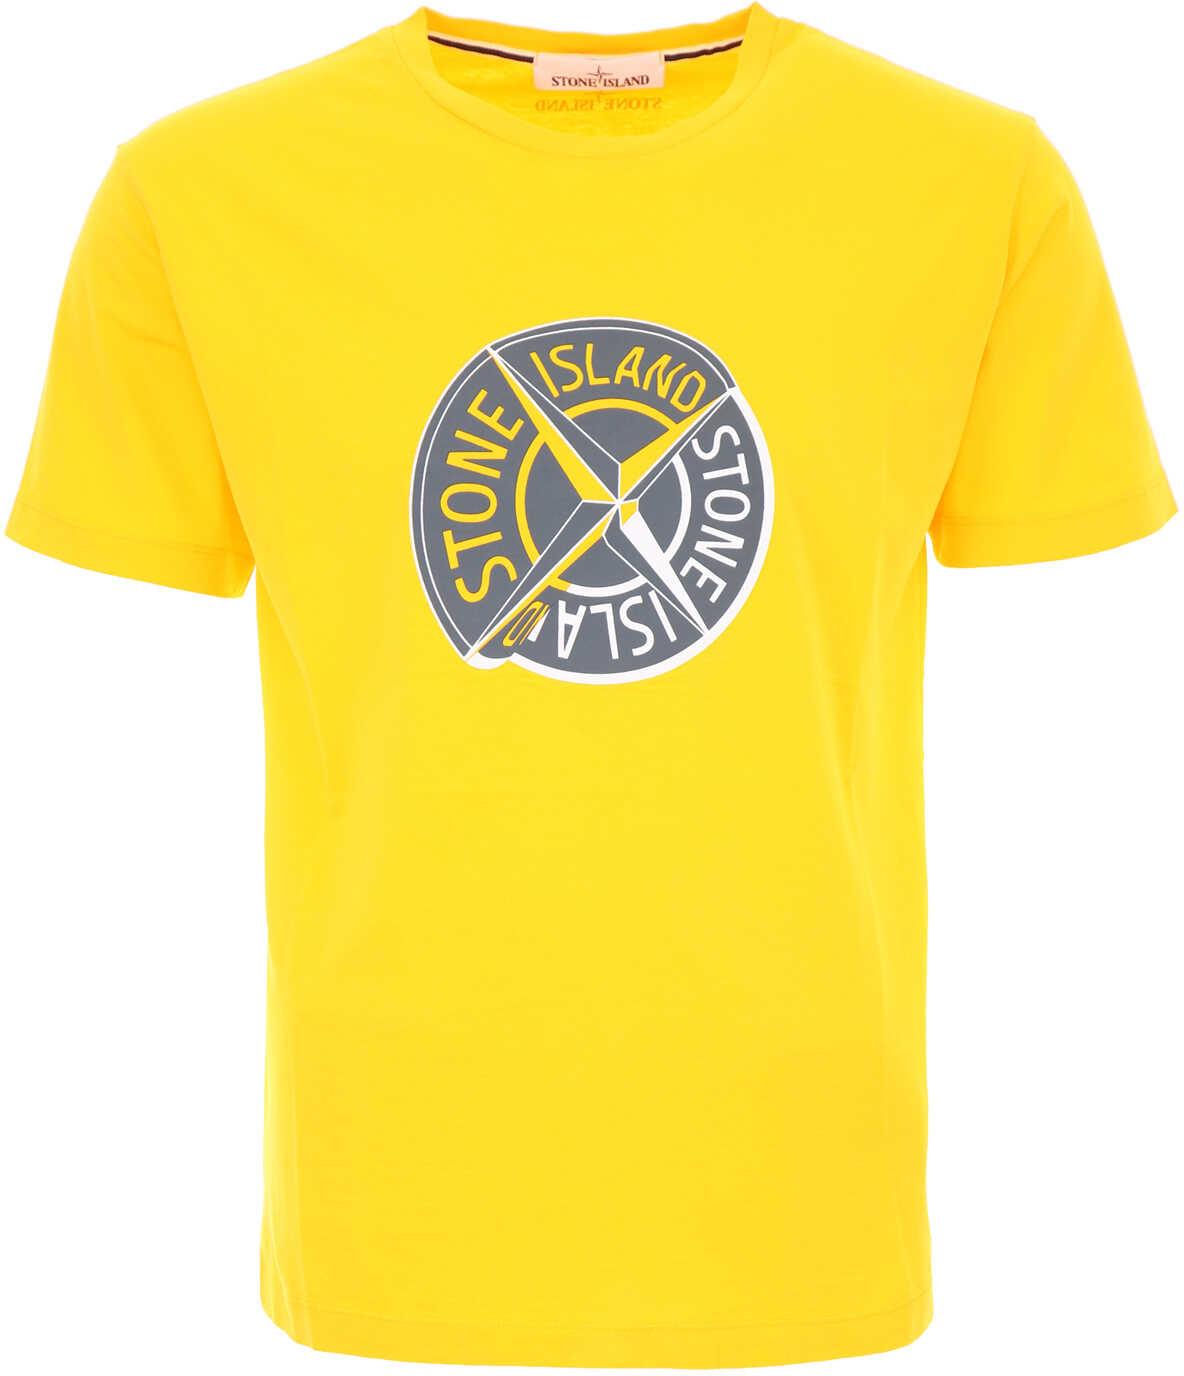 Stone Island Logo T-Shirt YELLOW